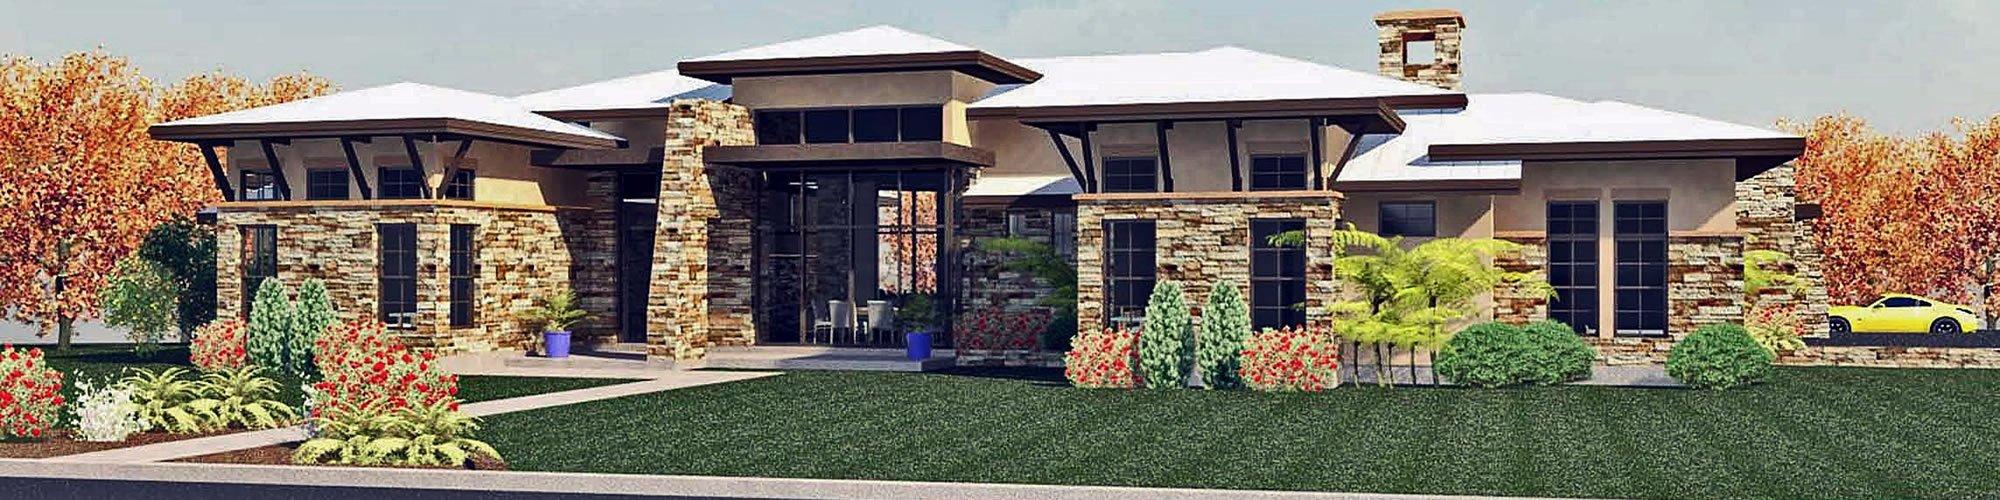 BIM/Design Resources, Inc. is a full service building Design Company.